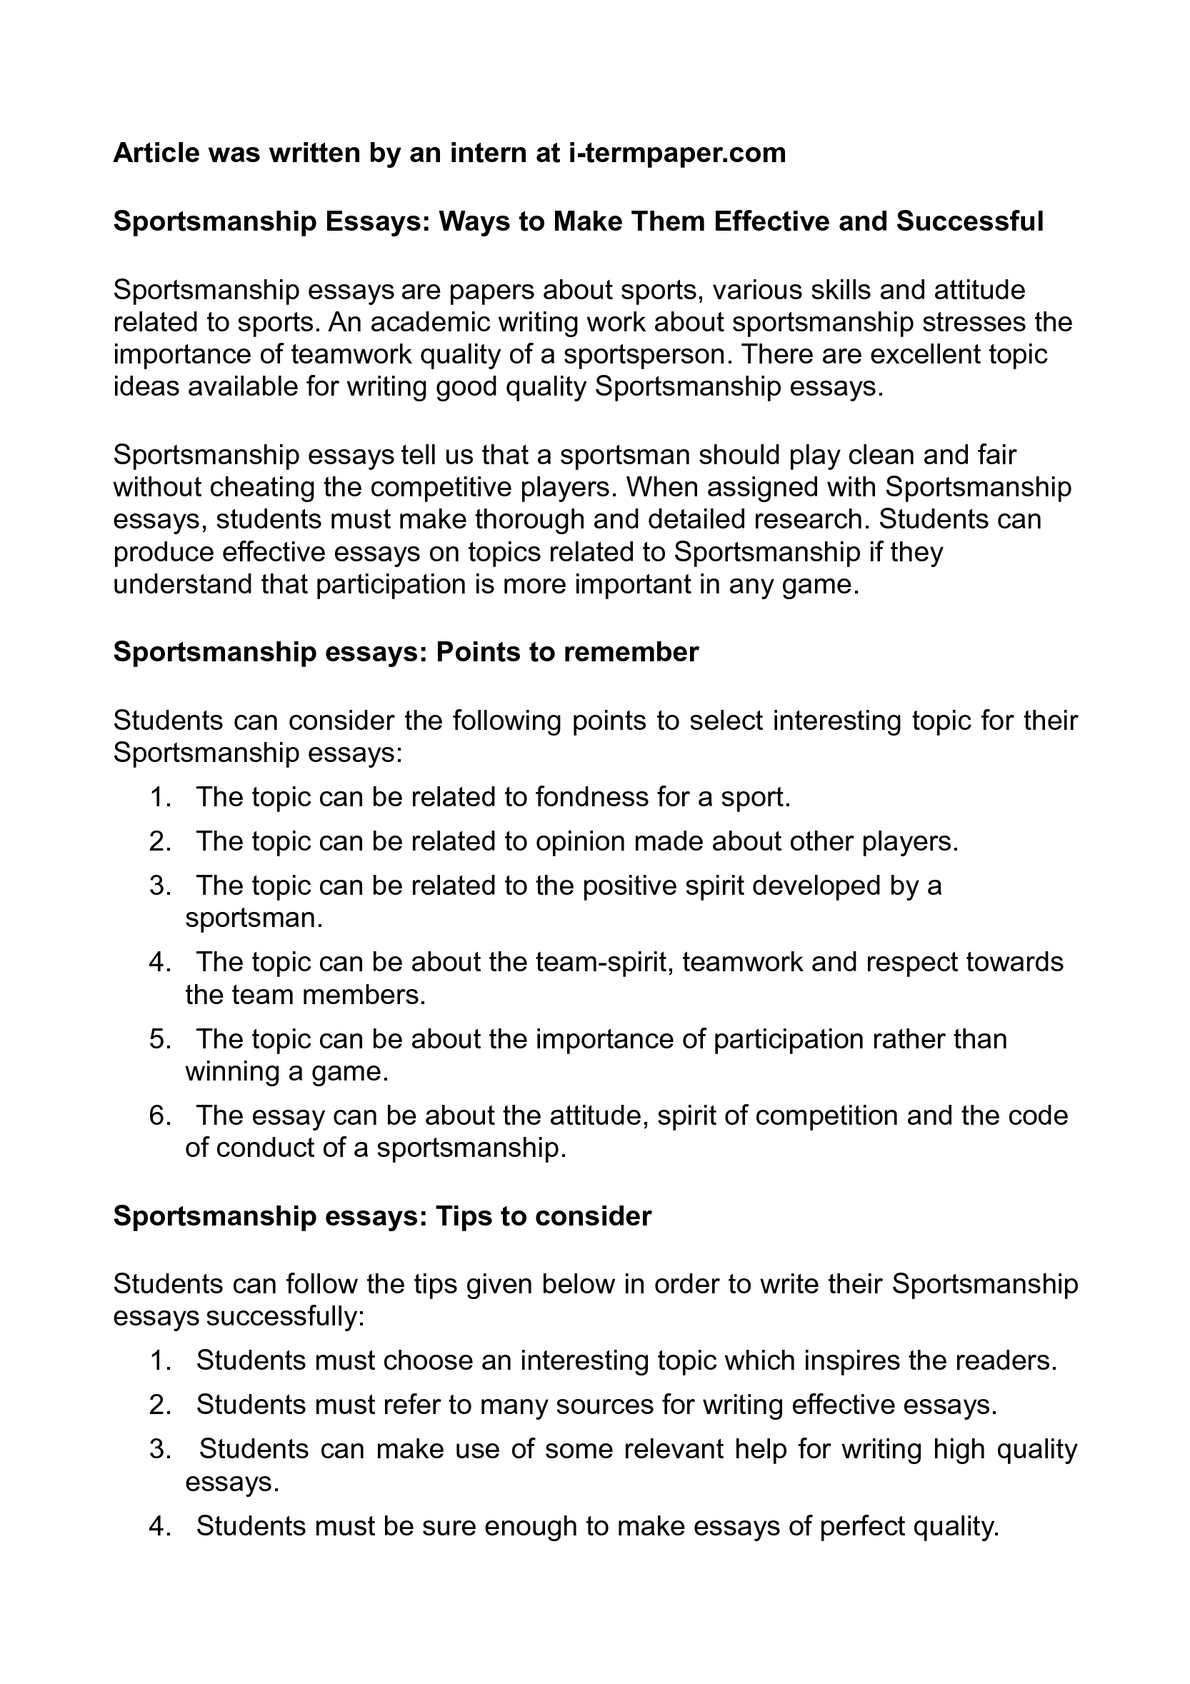 001 Essay Example Sportsmanship Shocking Ideas Pdf In Hindi Full